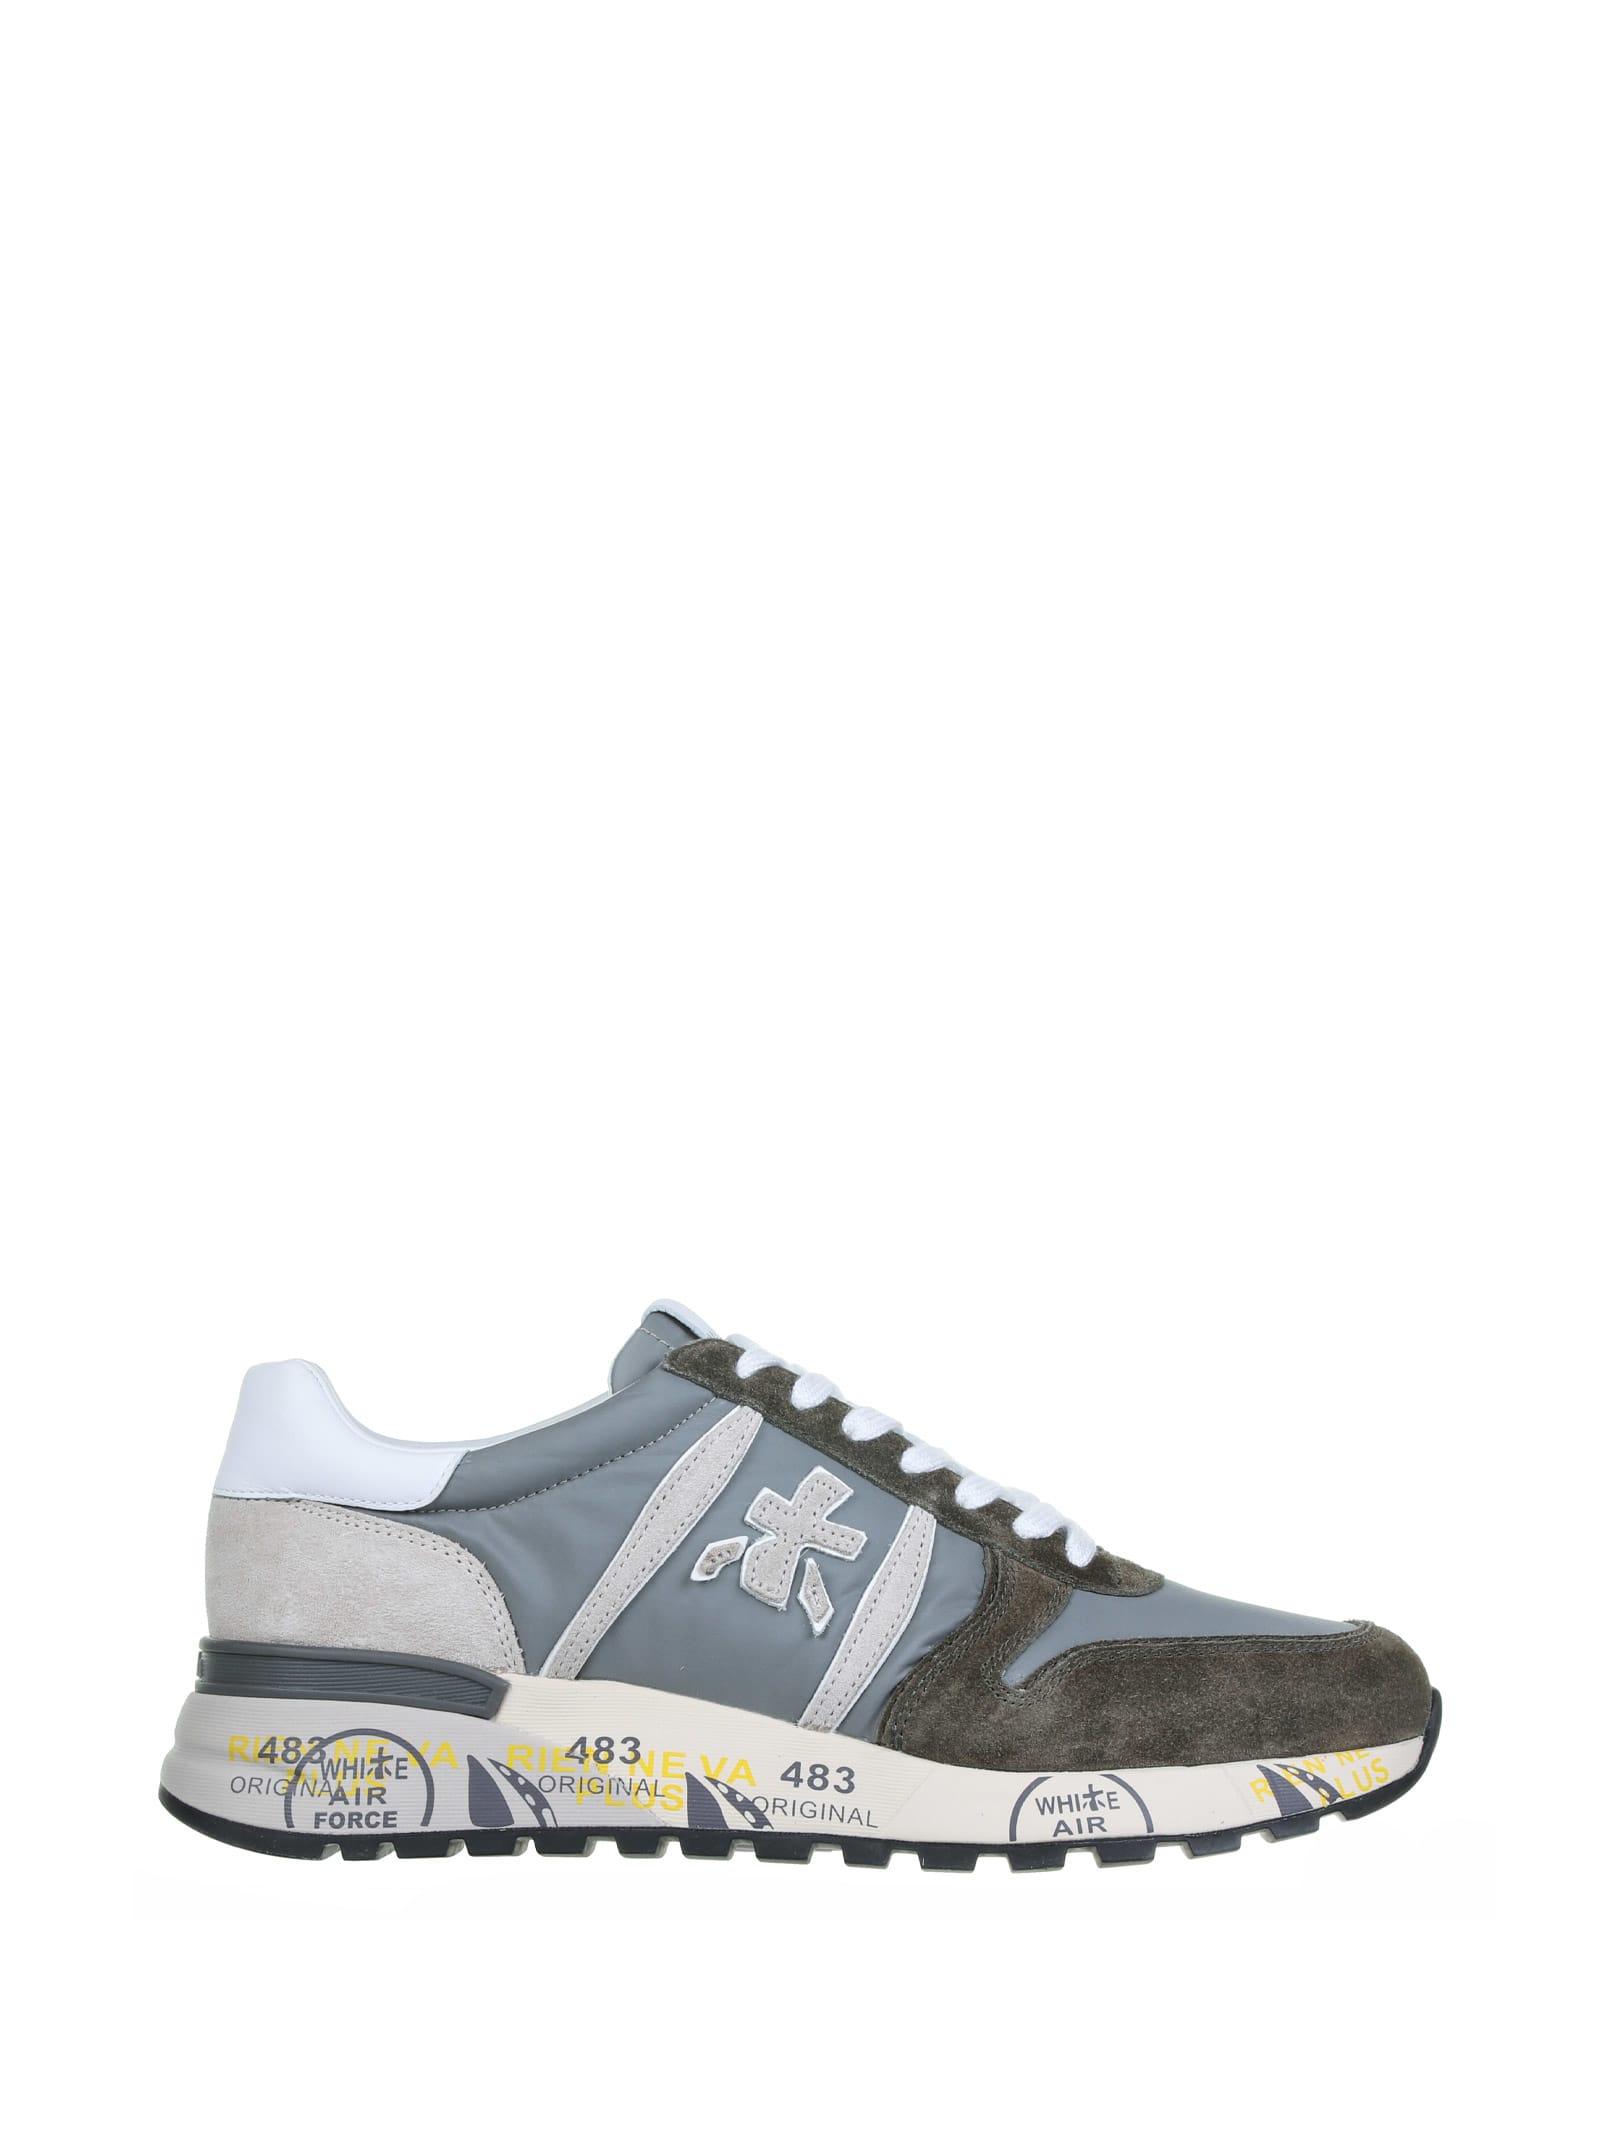 Premiata Shoes LANDER 5195 SNEAKERS